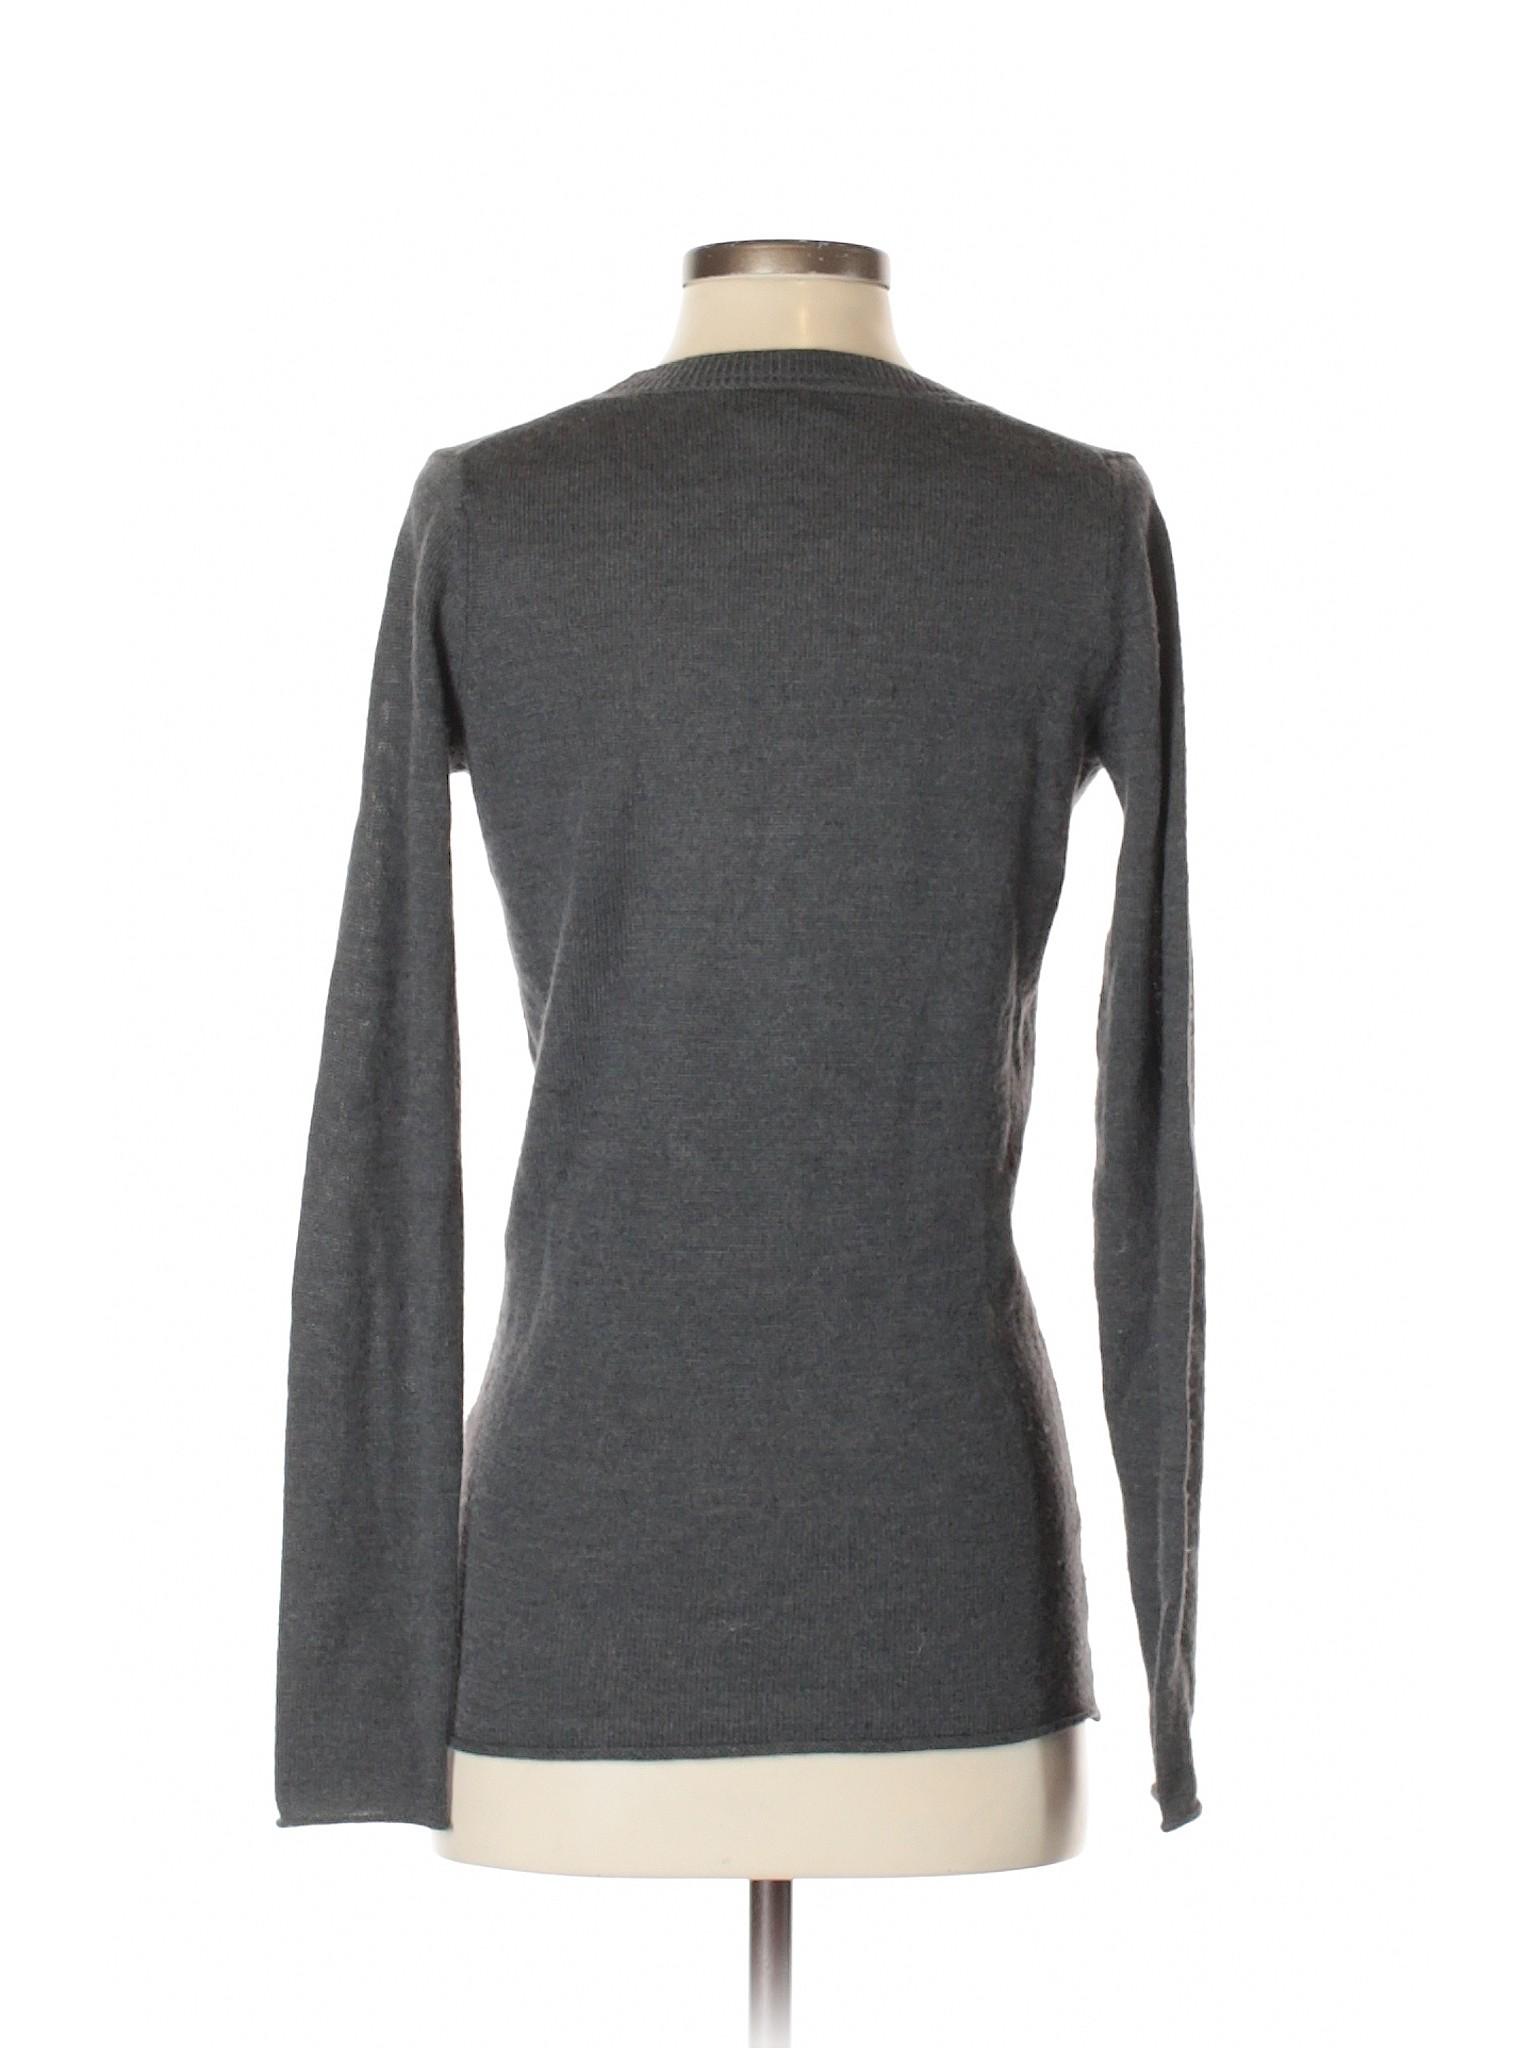 Wool winter Pullover Boutique Sweater Gap wEnpxX